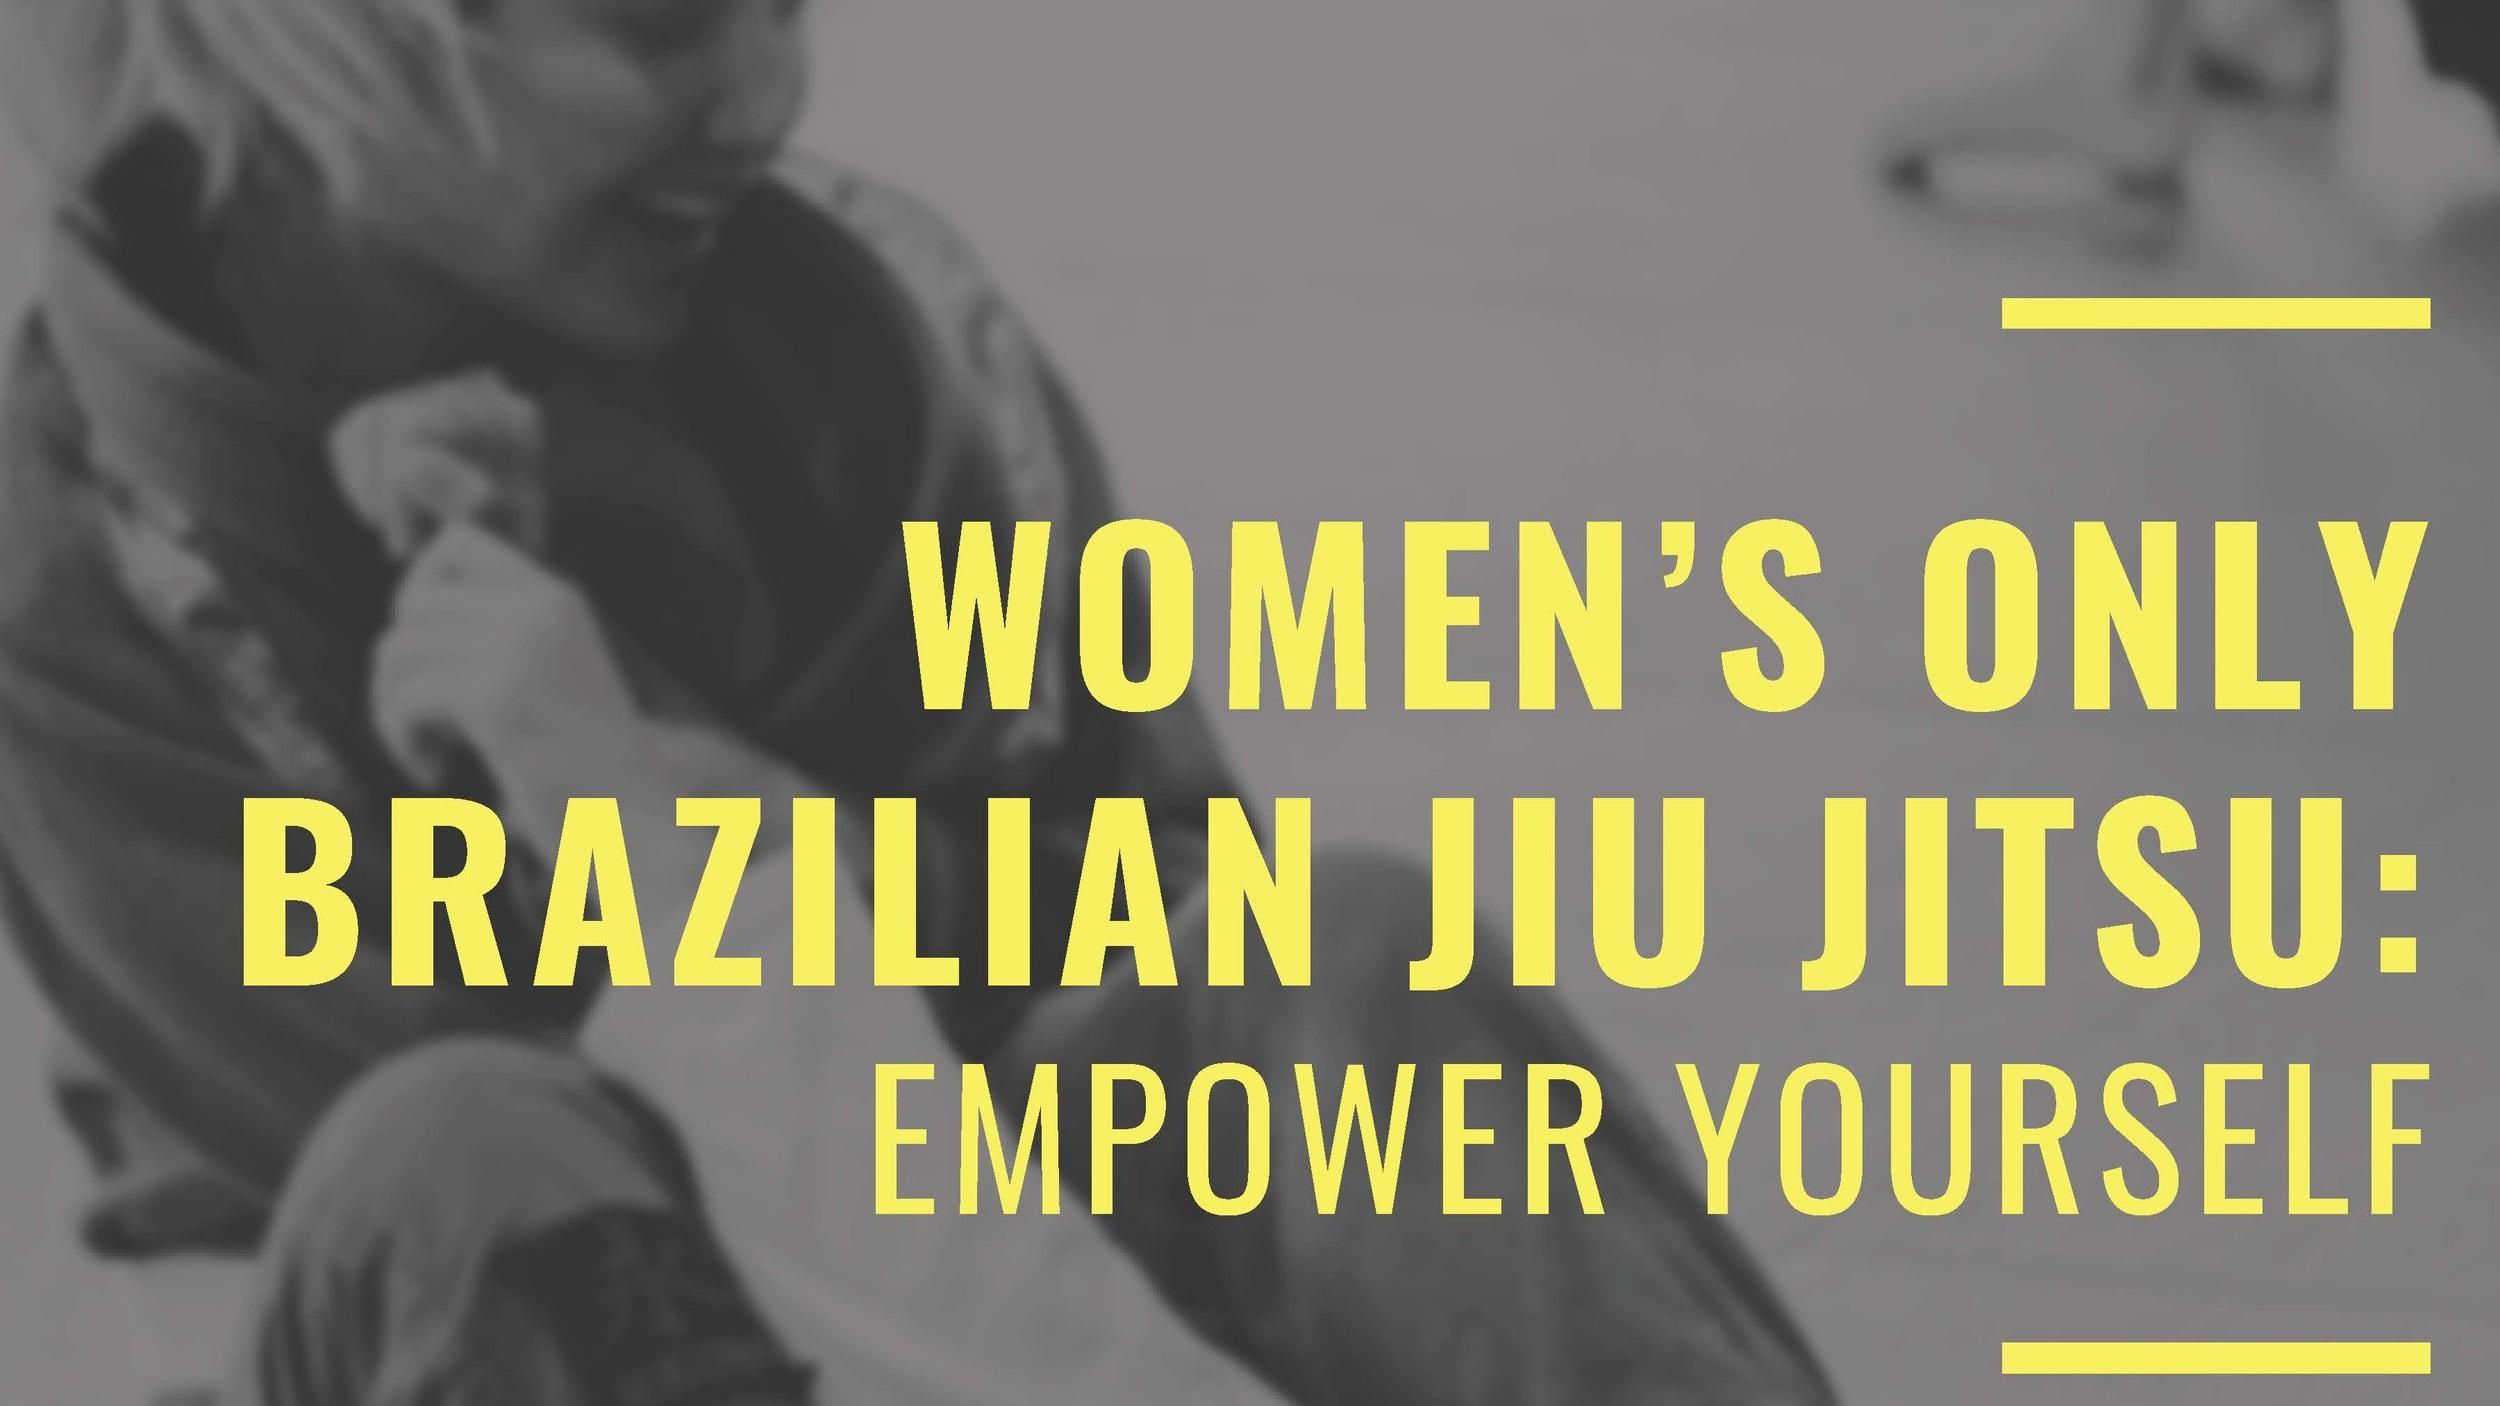 Women's Only Brazilian Jiu Jitsu - Wednesday's at 7:00PMNO EXPERIENCE NEEDEDGIS $120